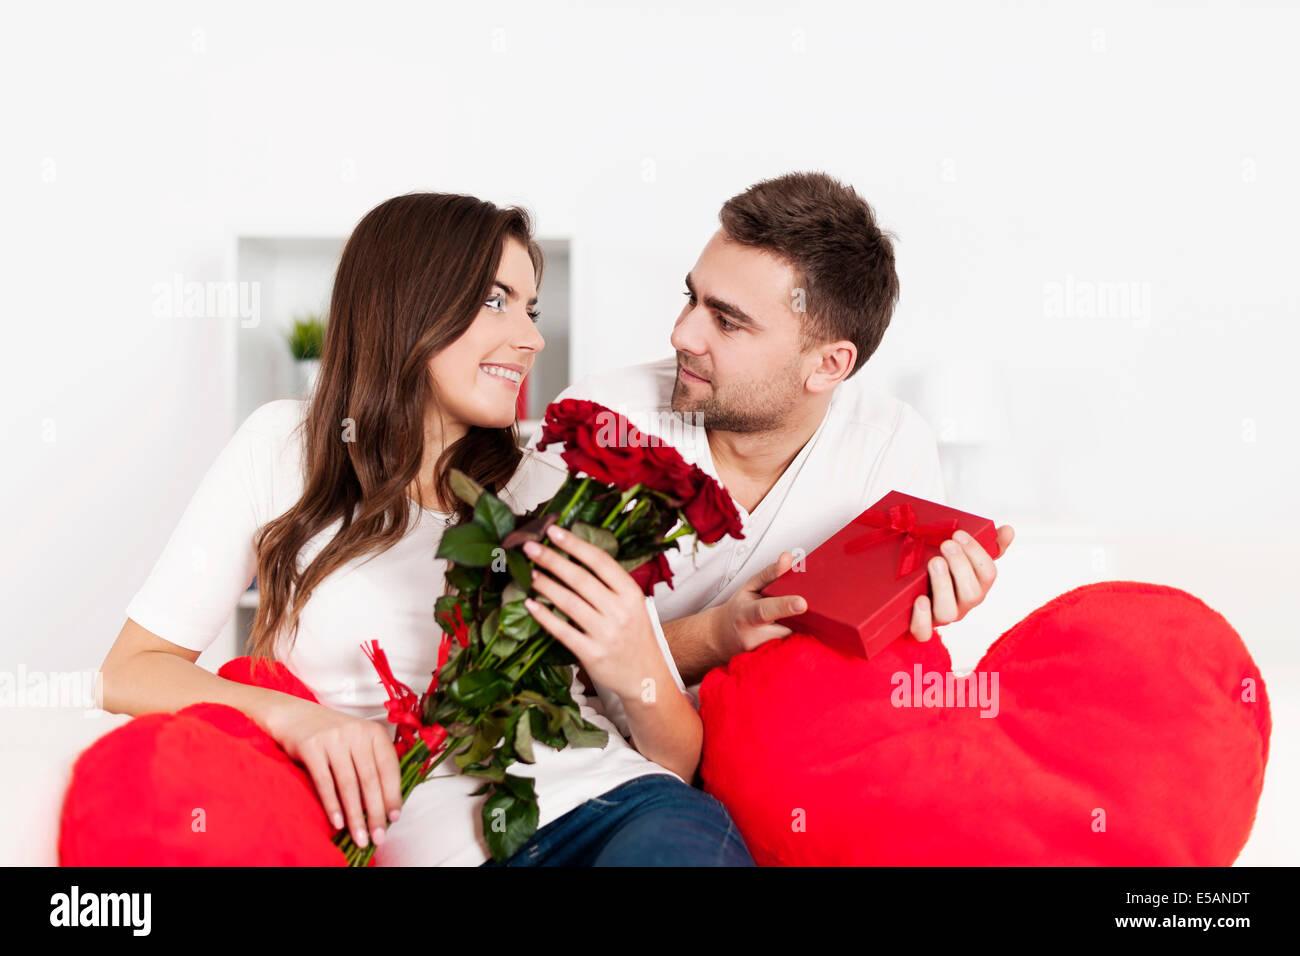 Если мужчина не дарит подарки: мнение психолога Михаила 27